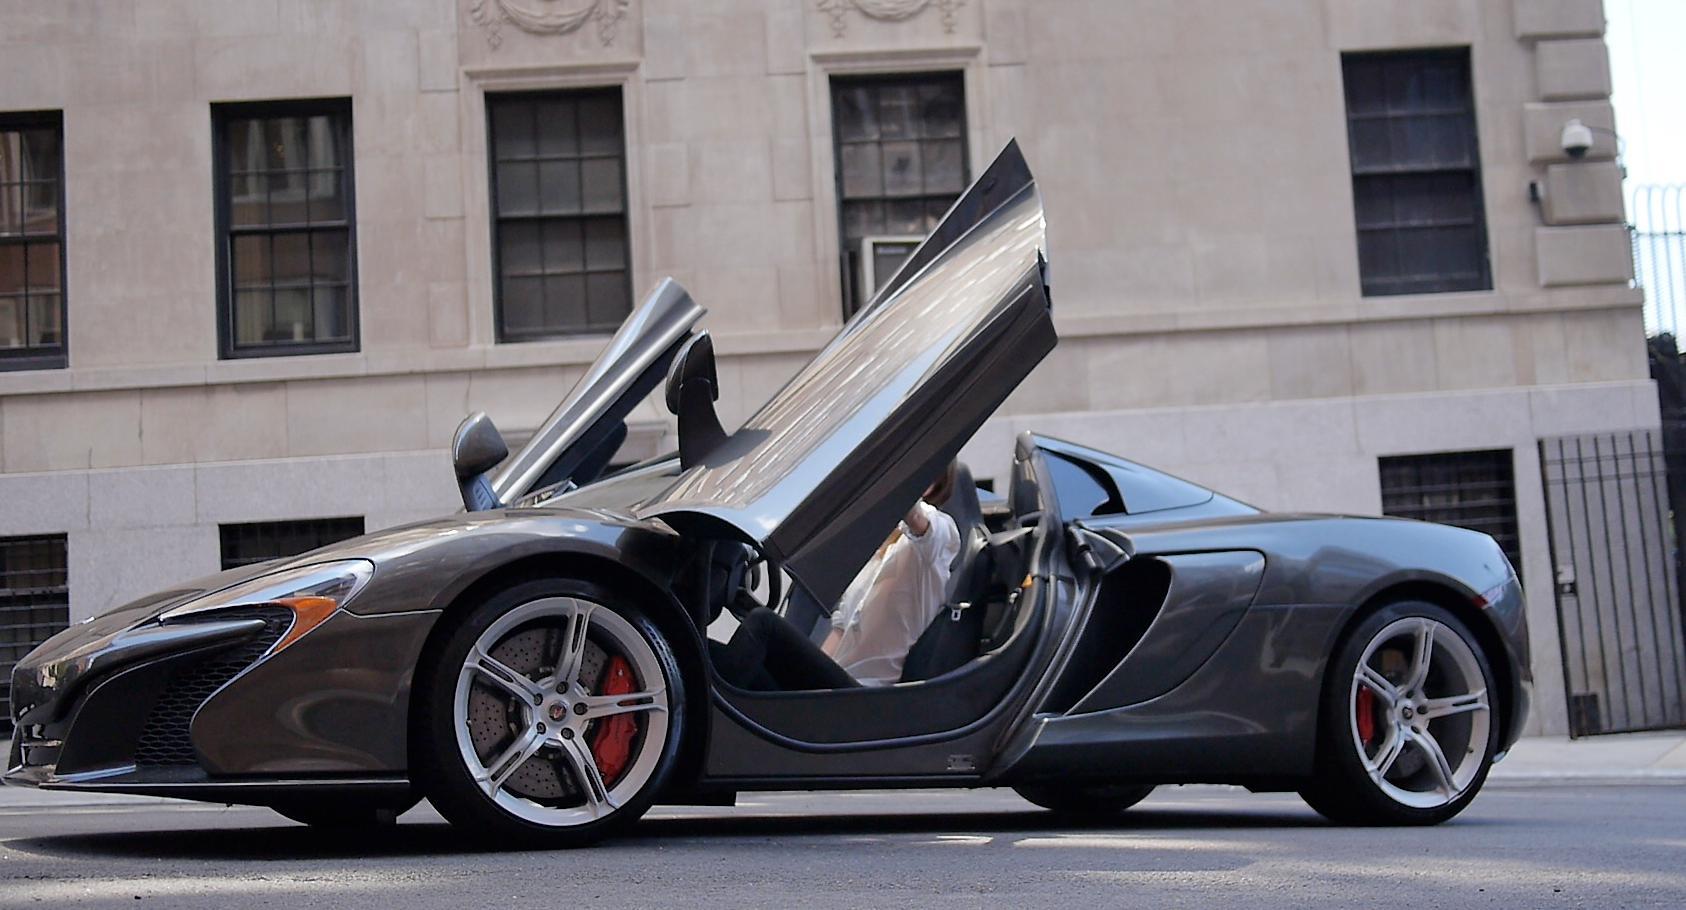 Worksheet. The 2015 McLaren 650S Formula 1s Beautiful Street Car